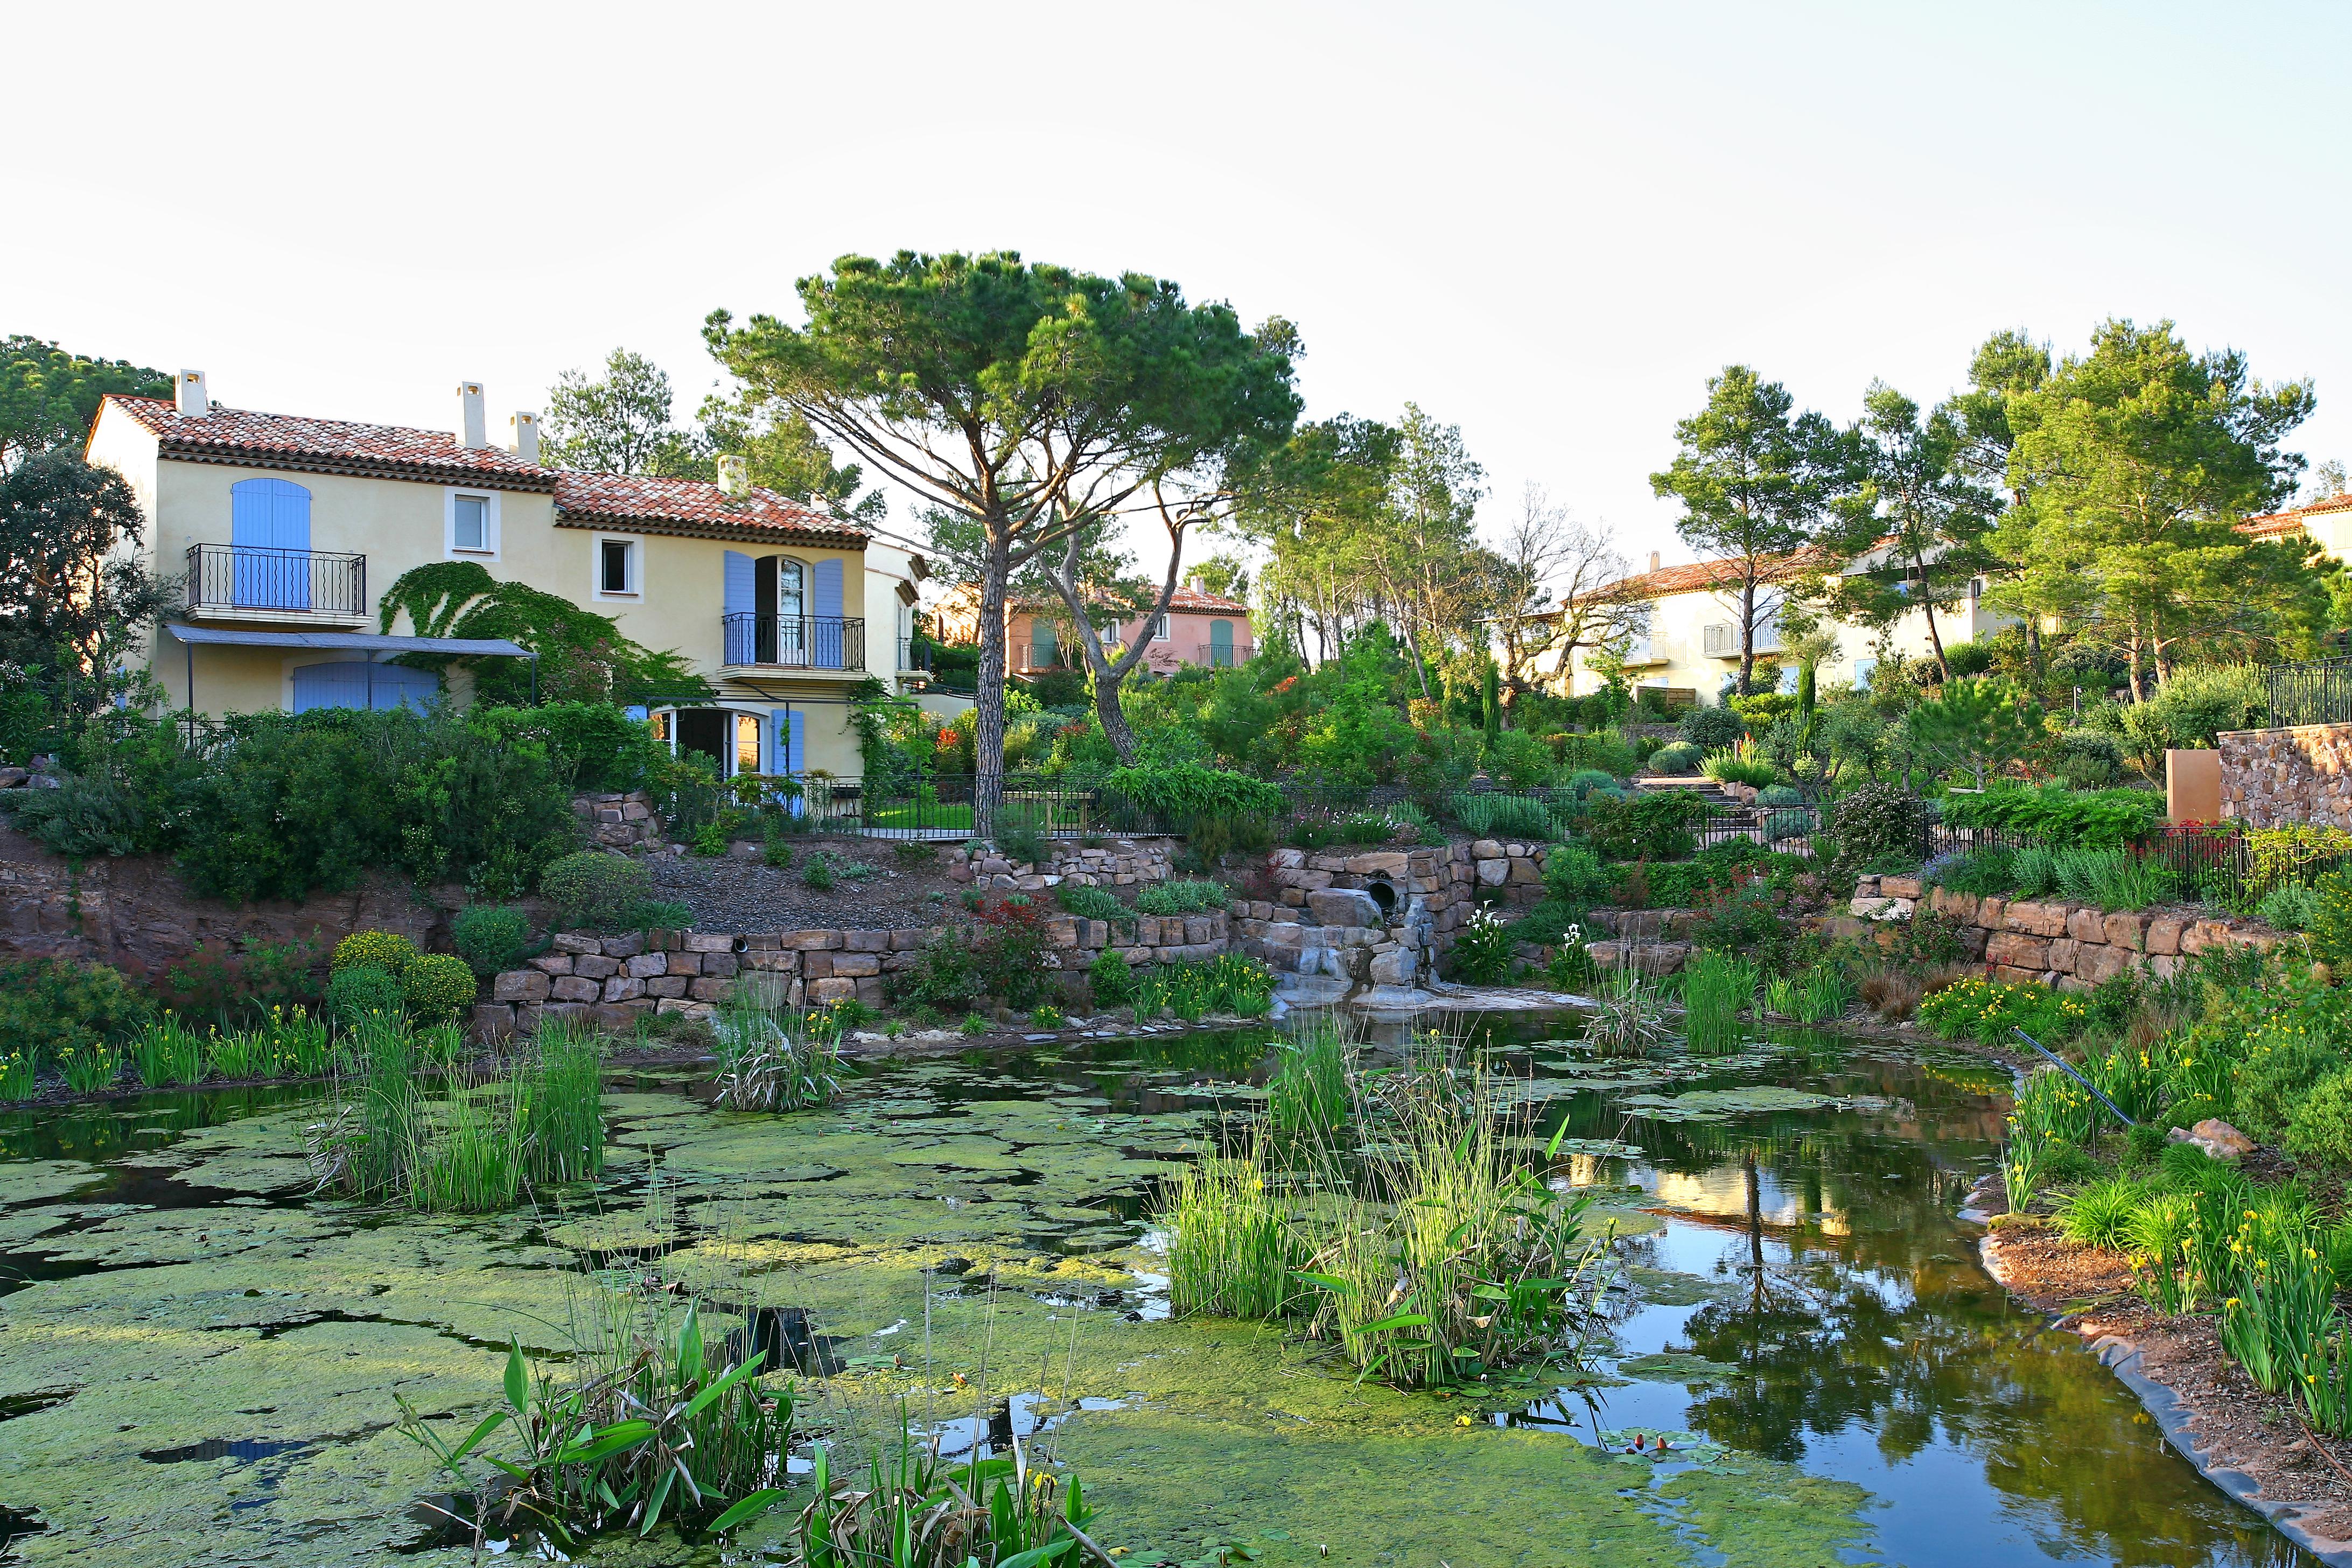 golf-expedition-golf-reizen-frankrijk-regio-cote-d'azur-Les-Domaines-de-Saint-Endréol-Golf-en-Spa-Resort-tuin